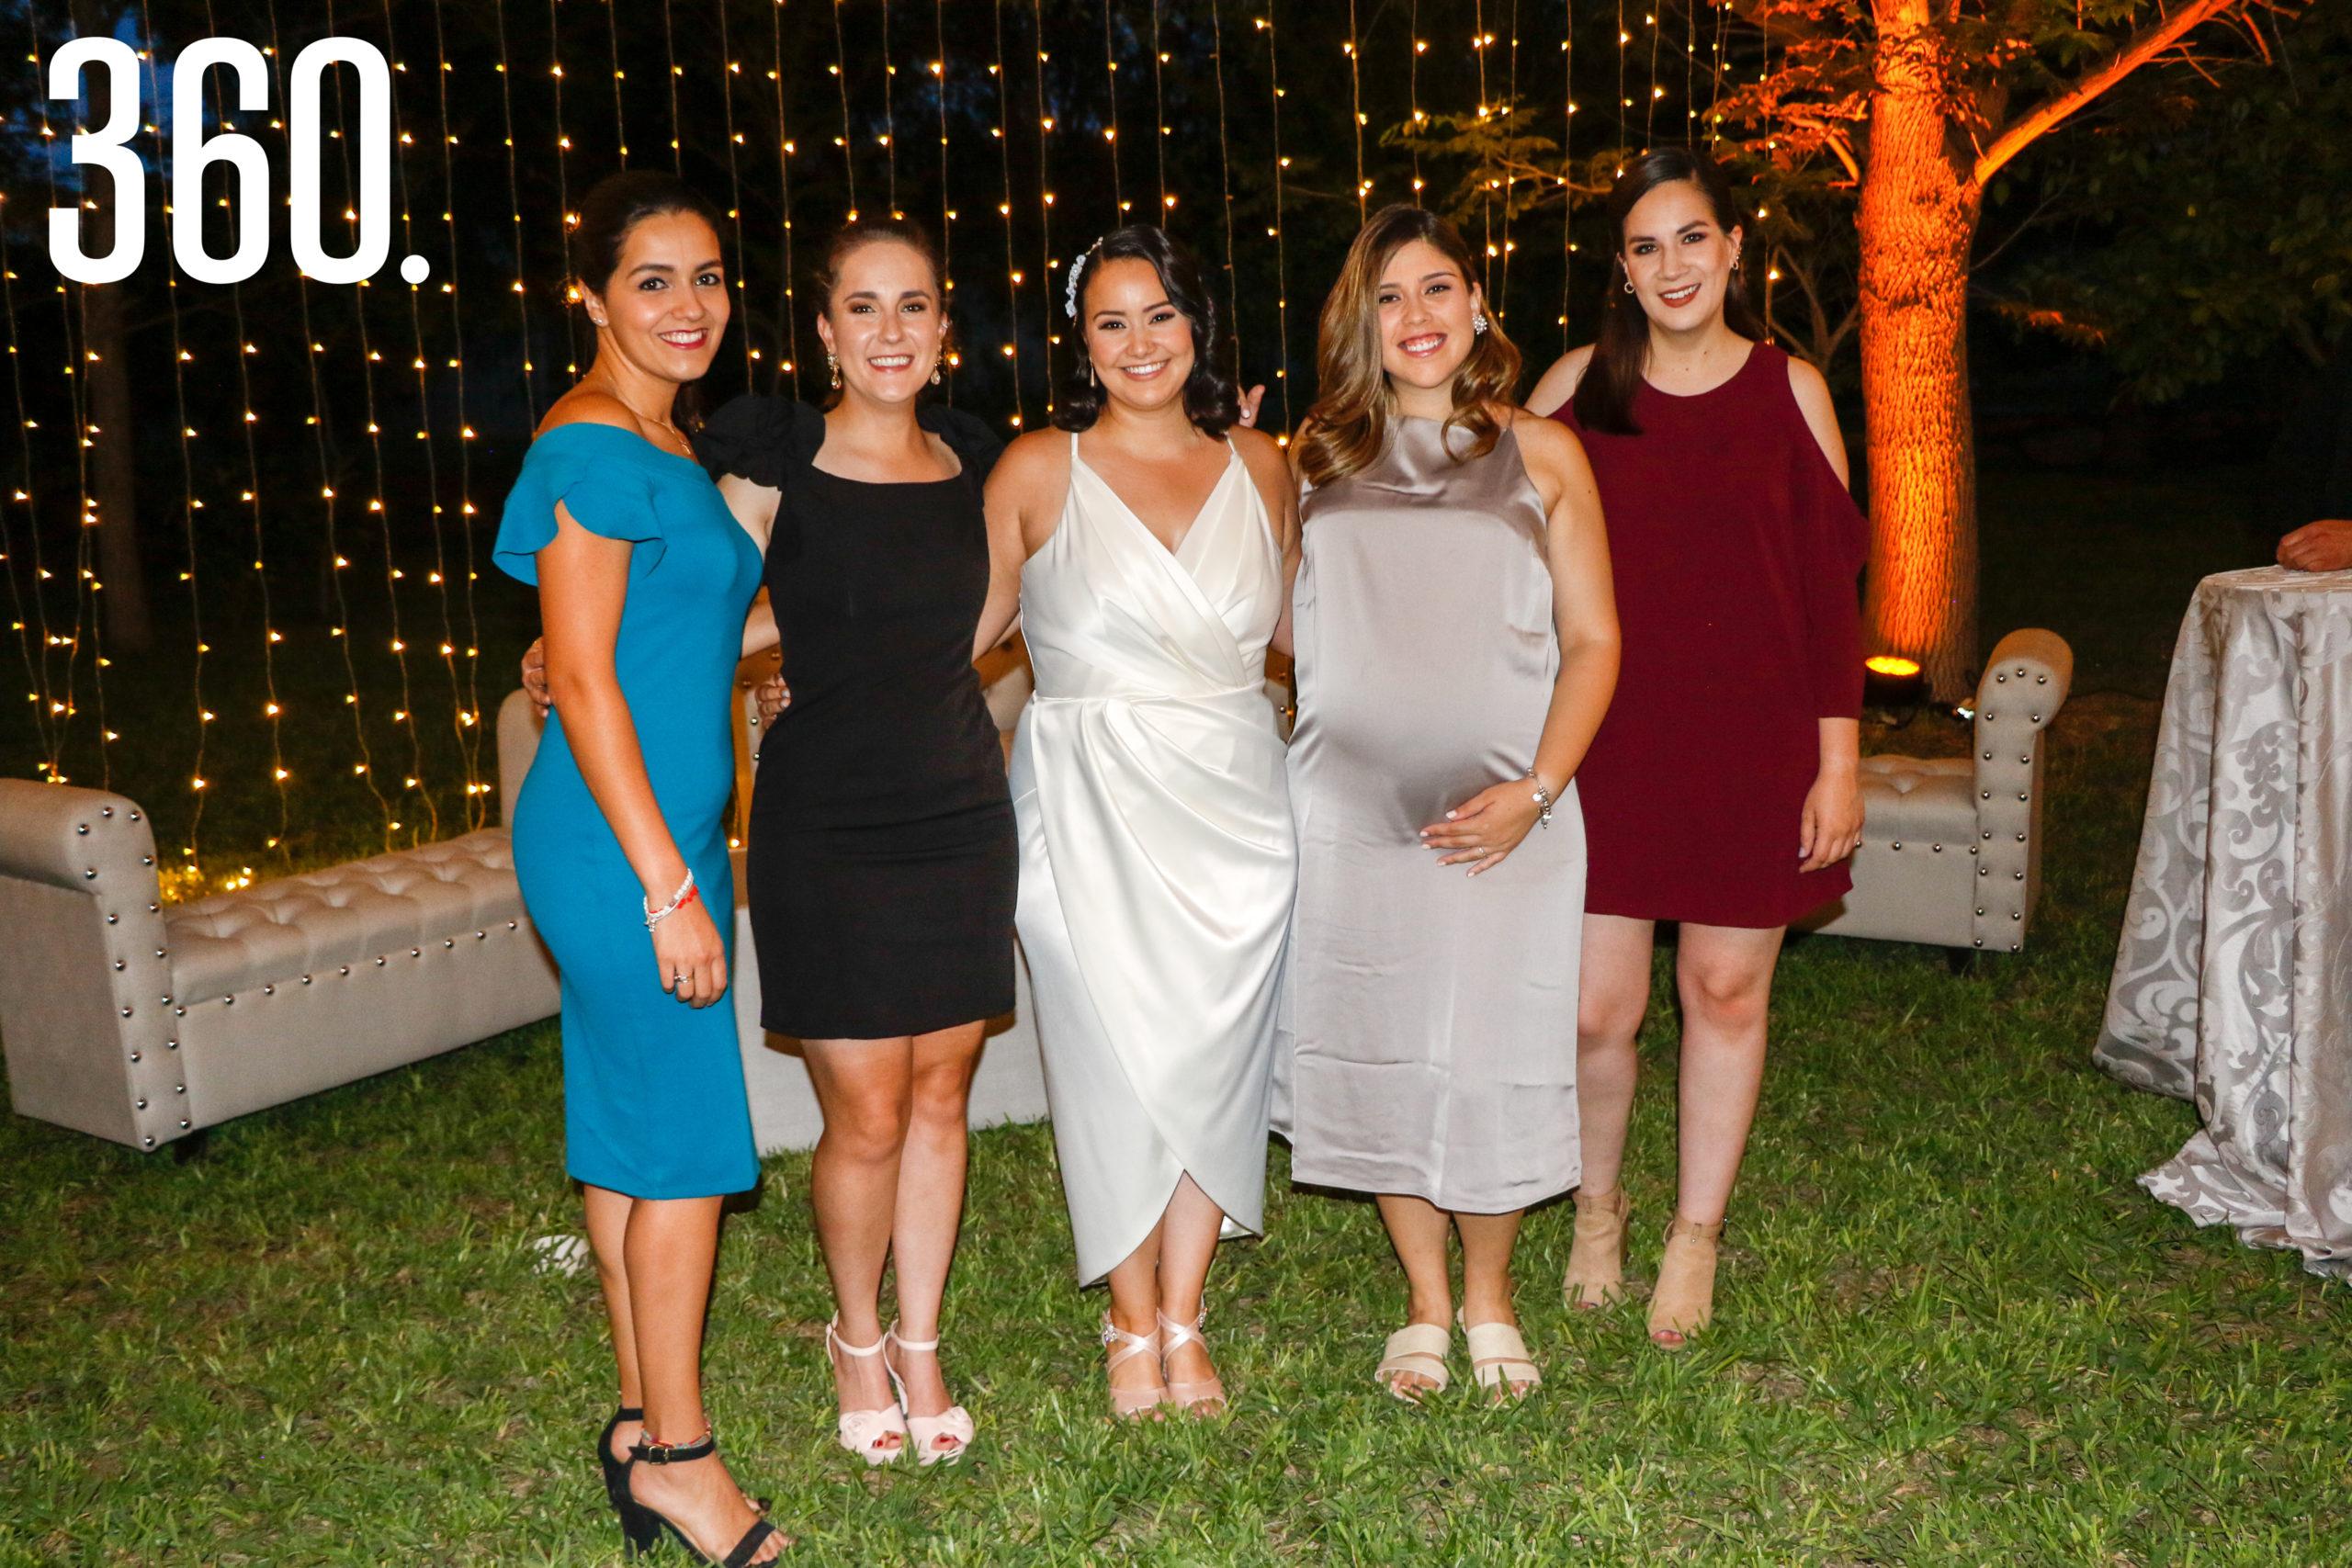 Lorena Fraustro, Orvilia Flores, Paulina Rangel, Claudia Coronado y Alejandra Reinaga.